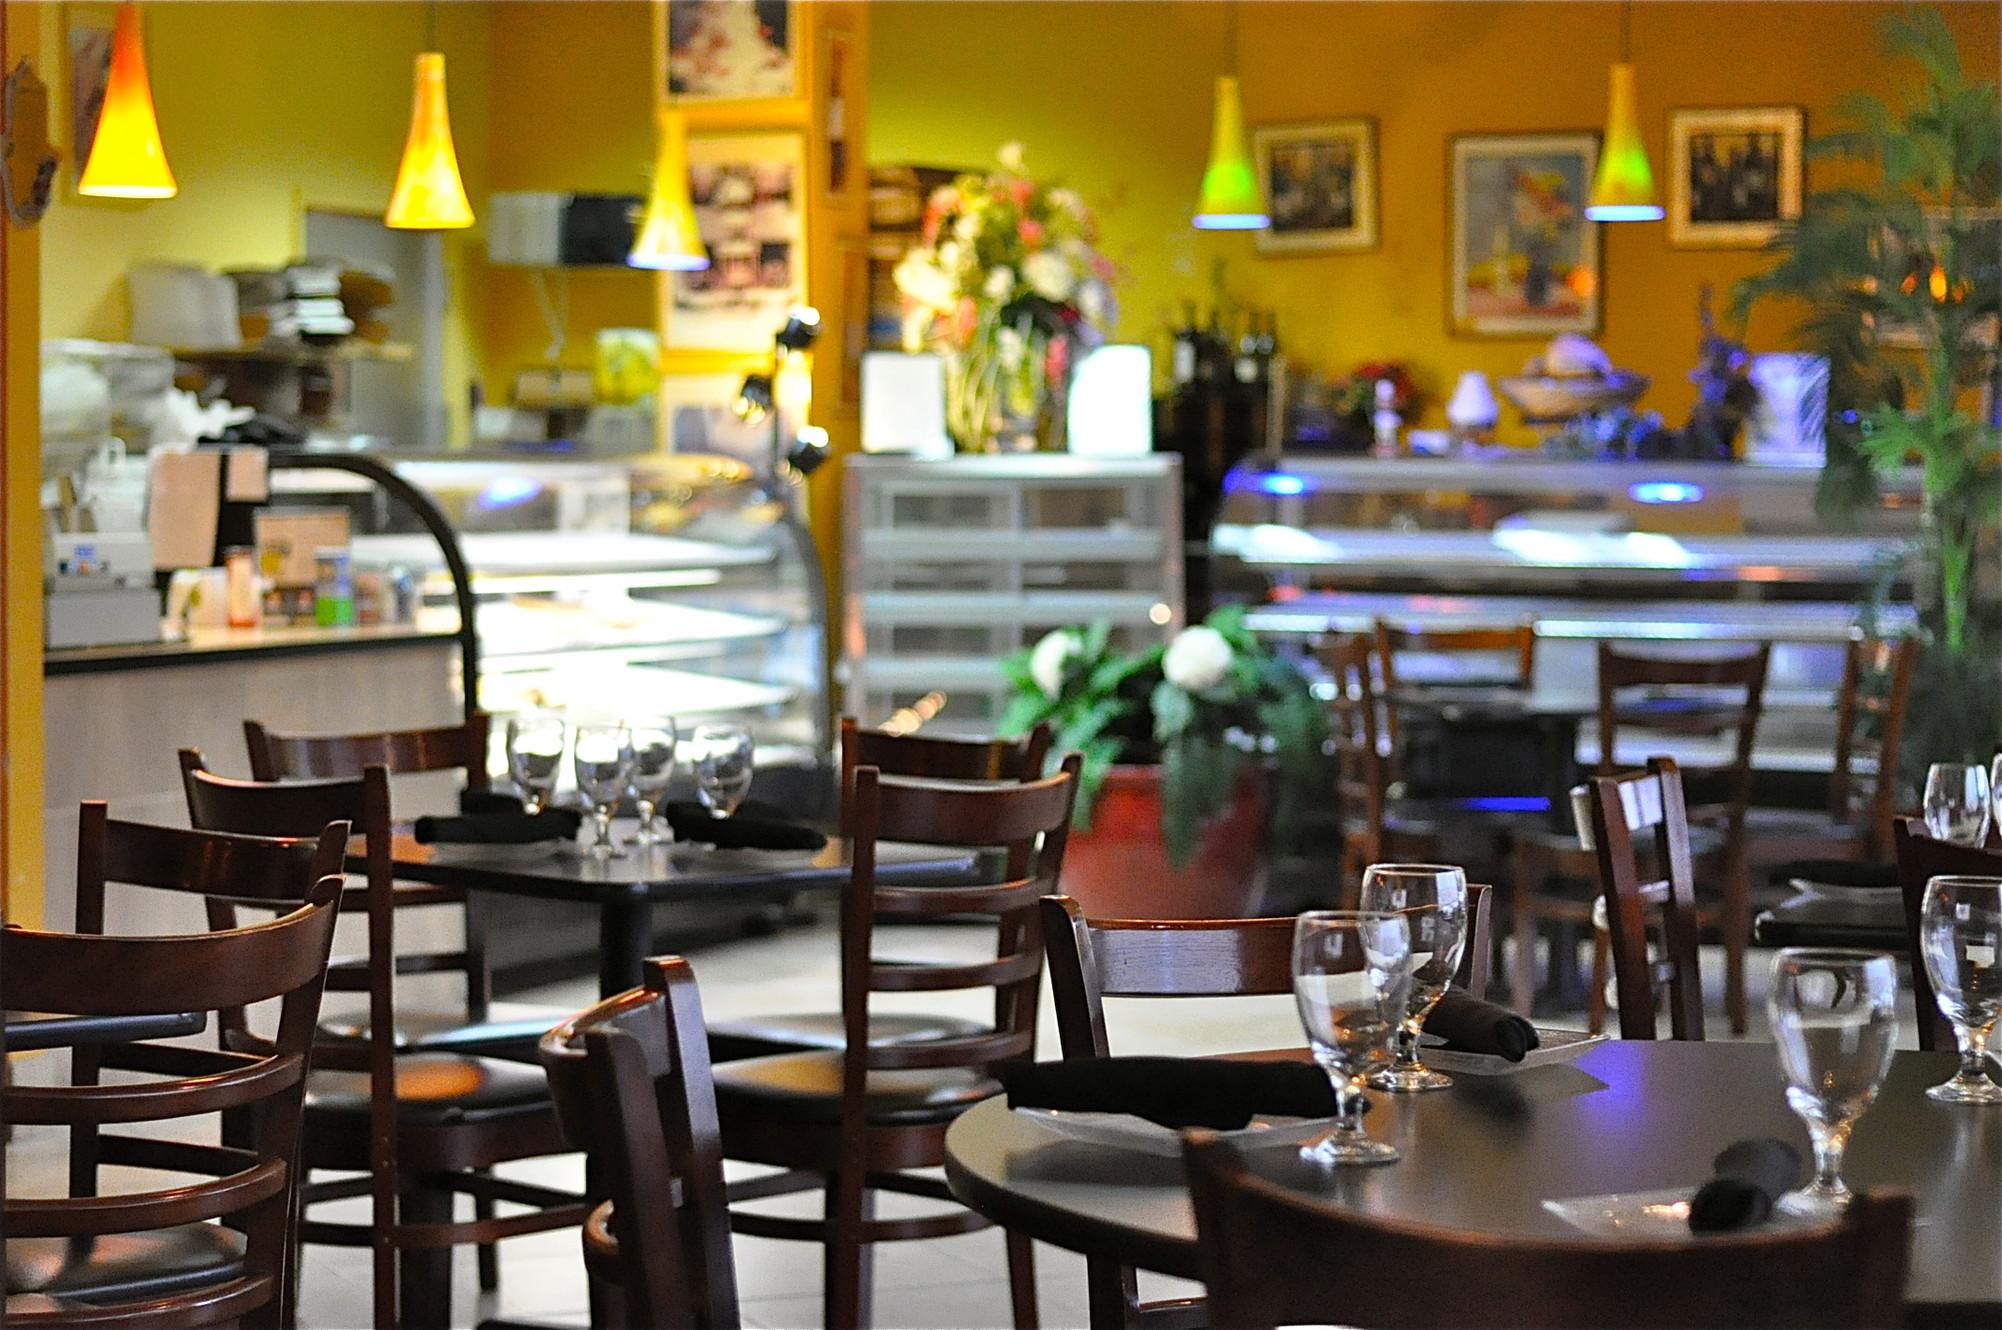 The Kosher Pastry Oven Restaurant, Bakery, & Cafe Silver